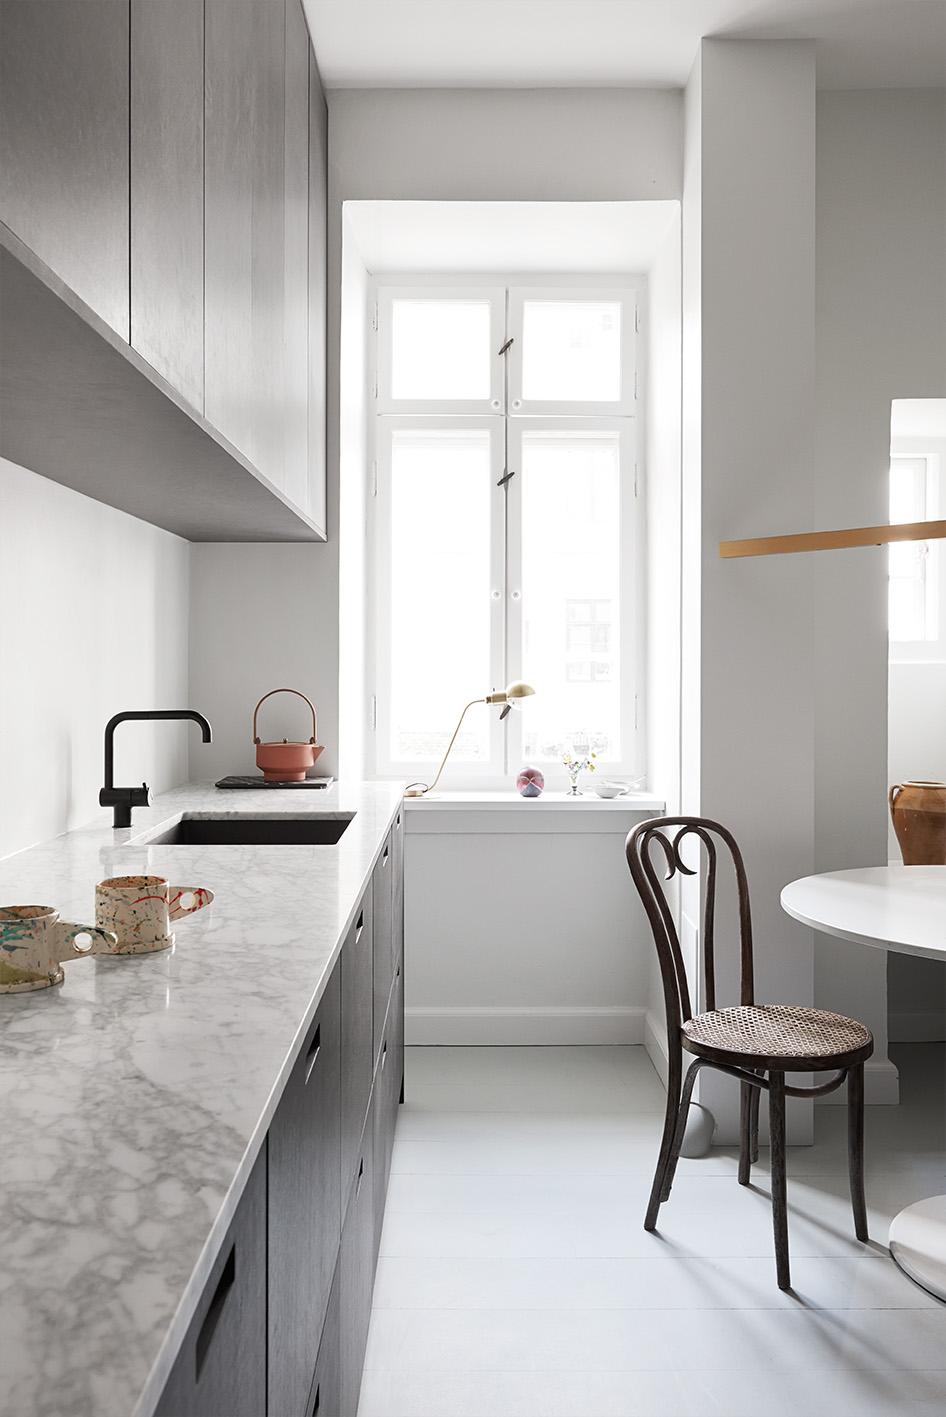 køkken-fronter-ikea-&SHUFL-sorte-køkkenlåger-med-messing-greb-marmor-bordplade